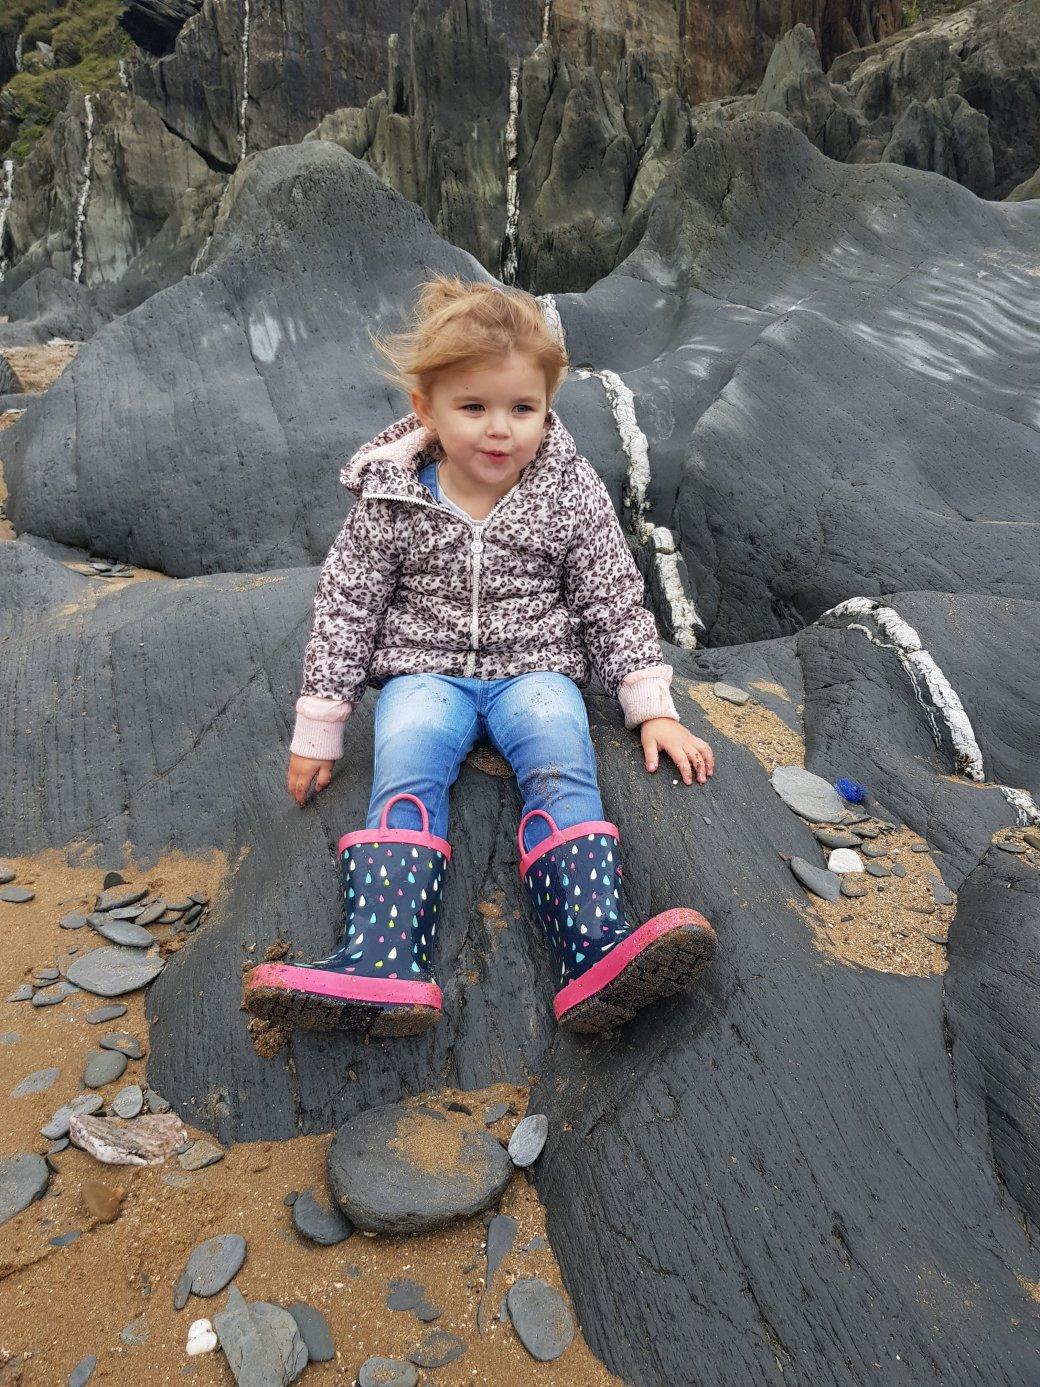 Shaniah on the rocks